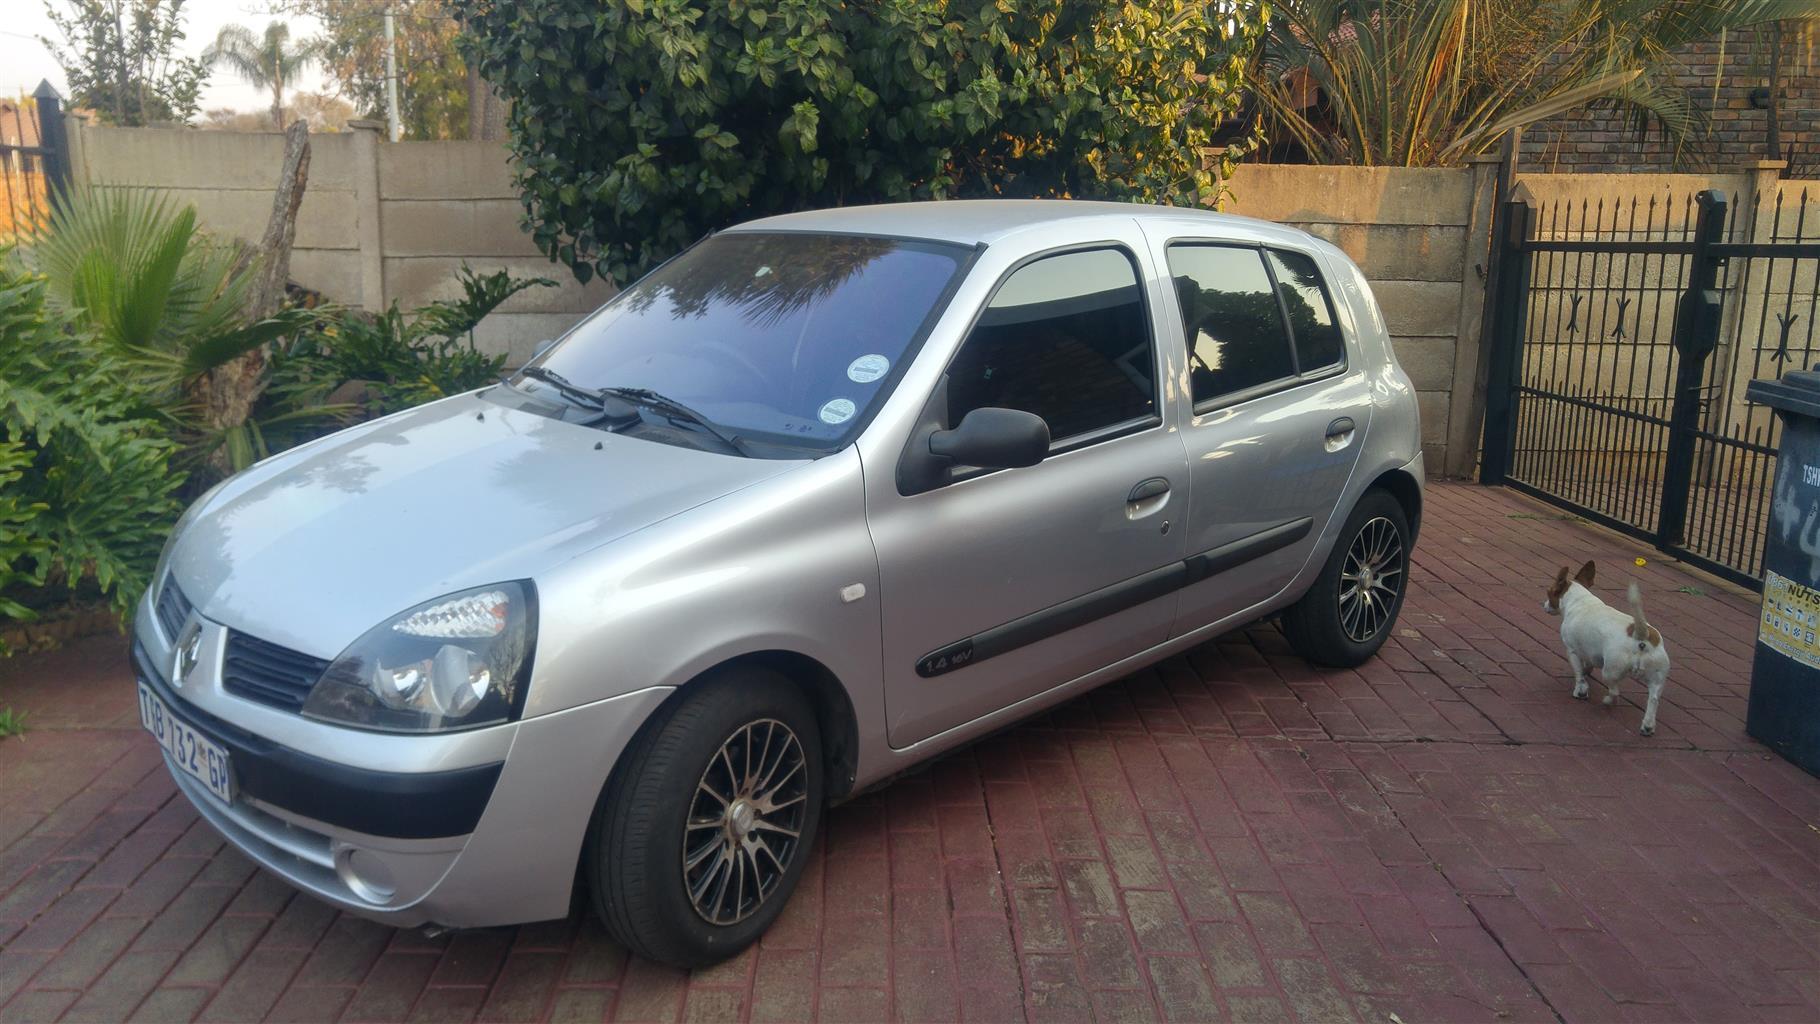 2005 Renault Clio 1.4 Expression 5 door